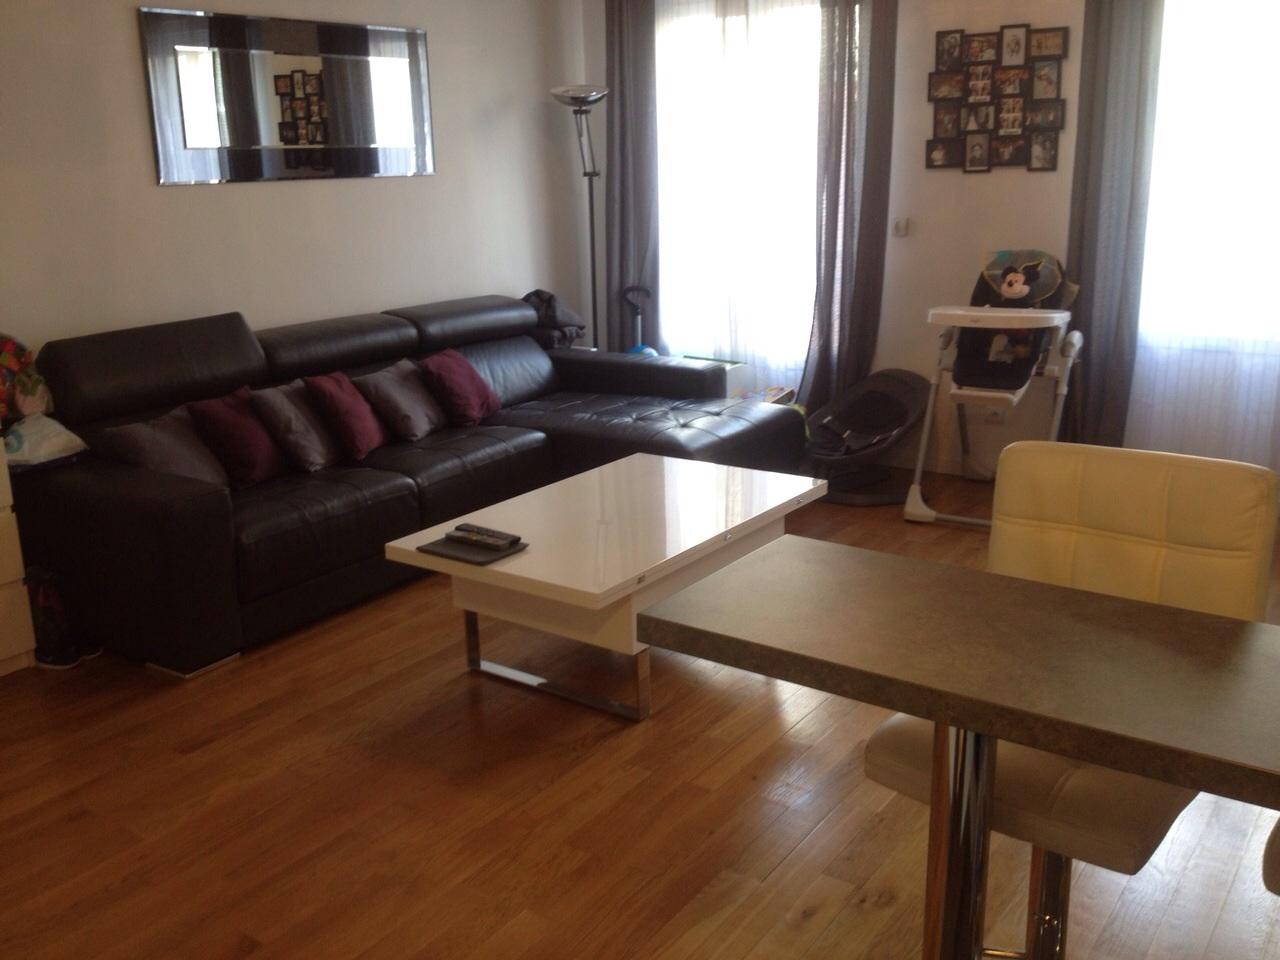 renovation appartement prix m2 renovation appartement prix m2 bureaux prestige prix r novation. Black Bedroom Furniture Sets. Home Design Ideas